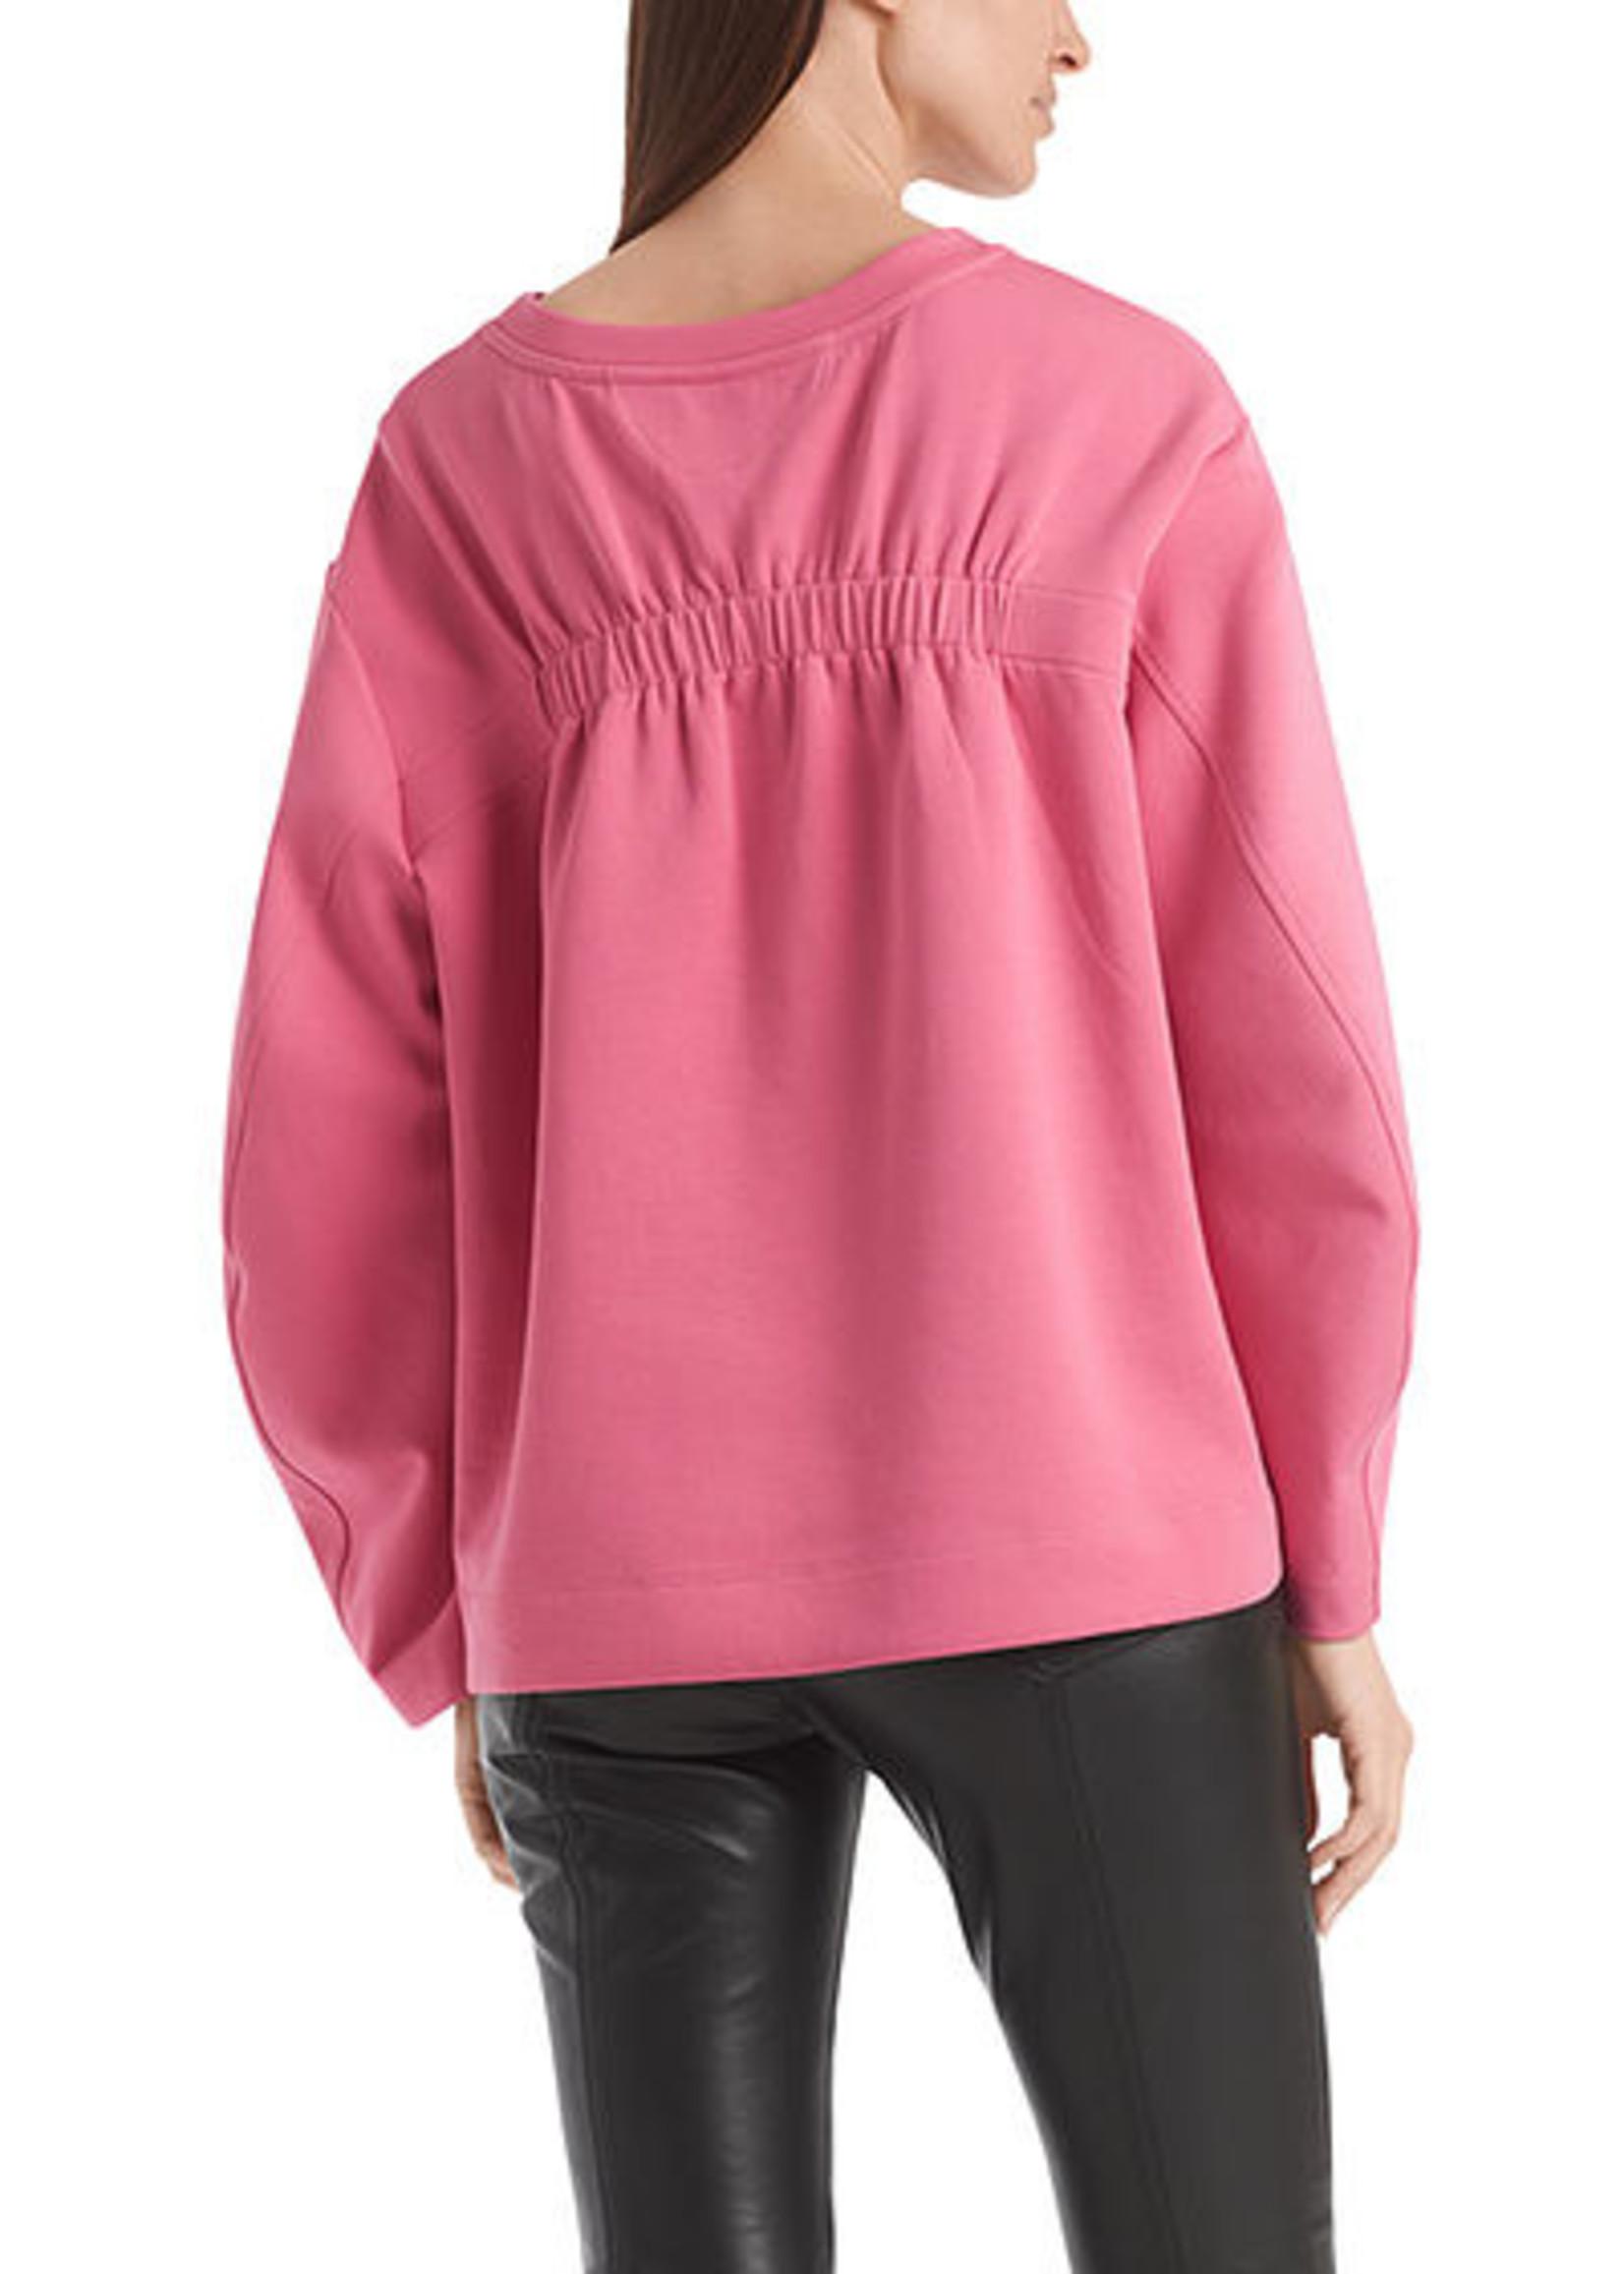 Marccain Sports Sweatshirt RS 44.08 J76 sugar coral